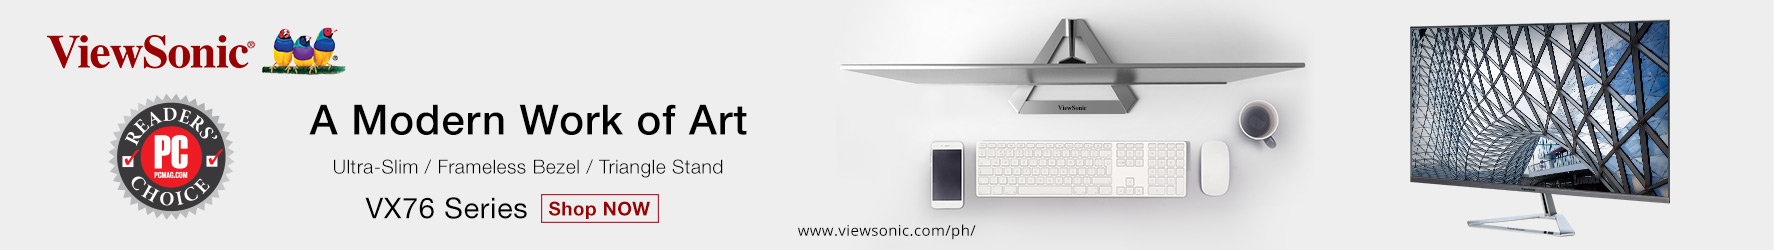 ViewSonic VX3276-2K-MHD 32″ 1440p Entertainment Monitor